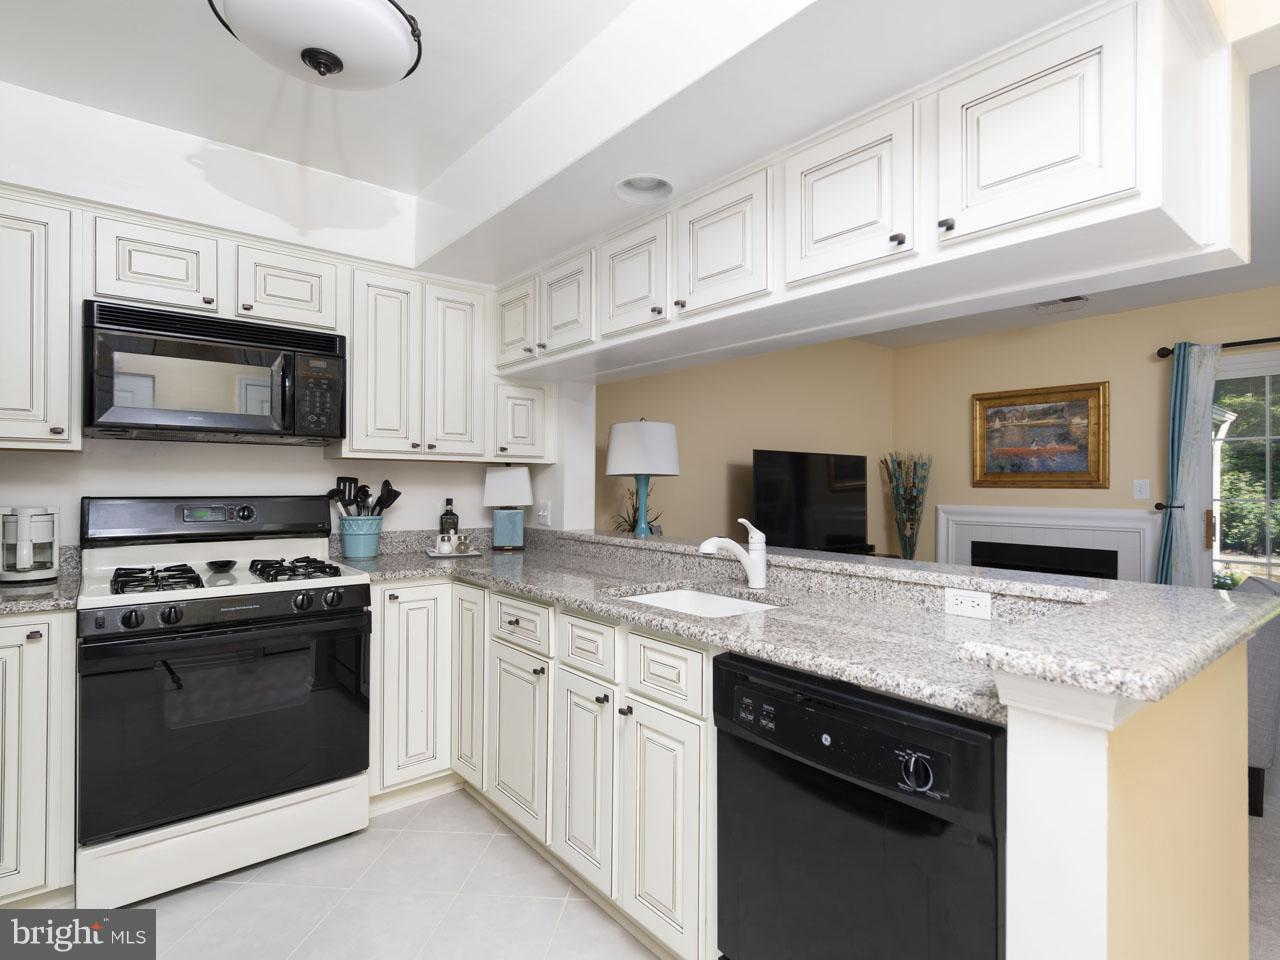 1002640508-300537942763-2021-07-22-05-00-37     Pinecrest   Alexandria Delaware Real Estate For Sale   MLS# 1002640508  - Best of Northern Virginia